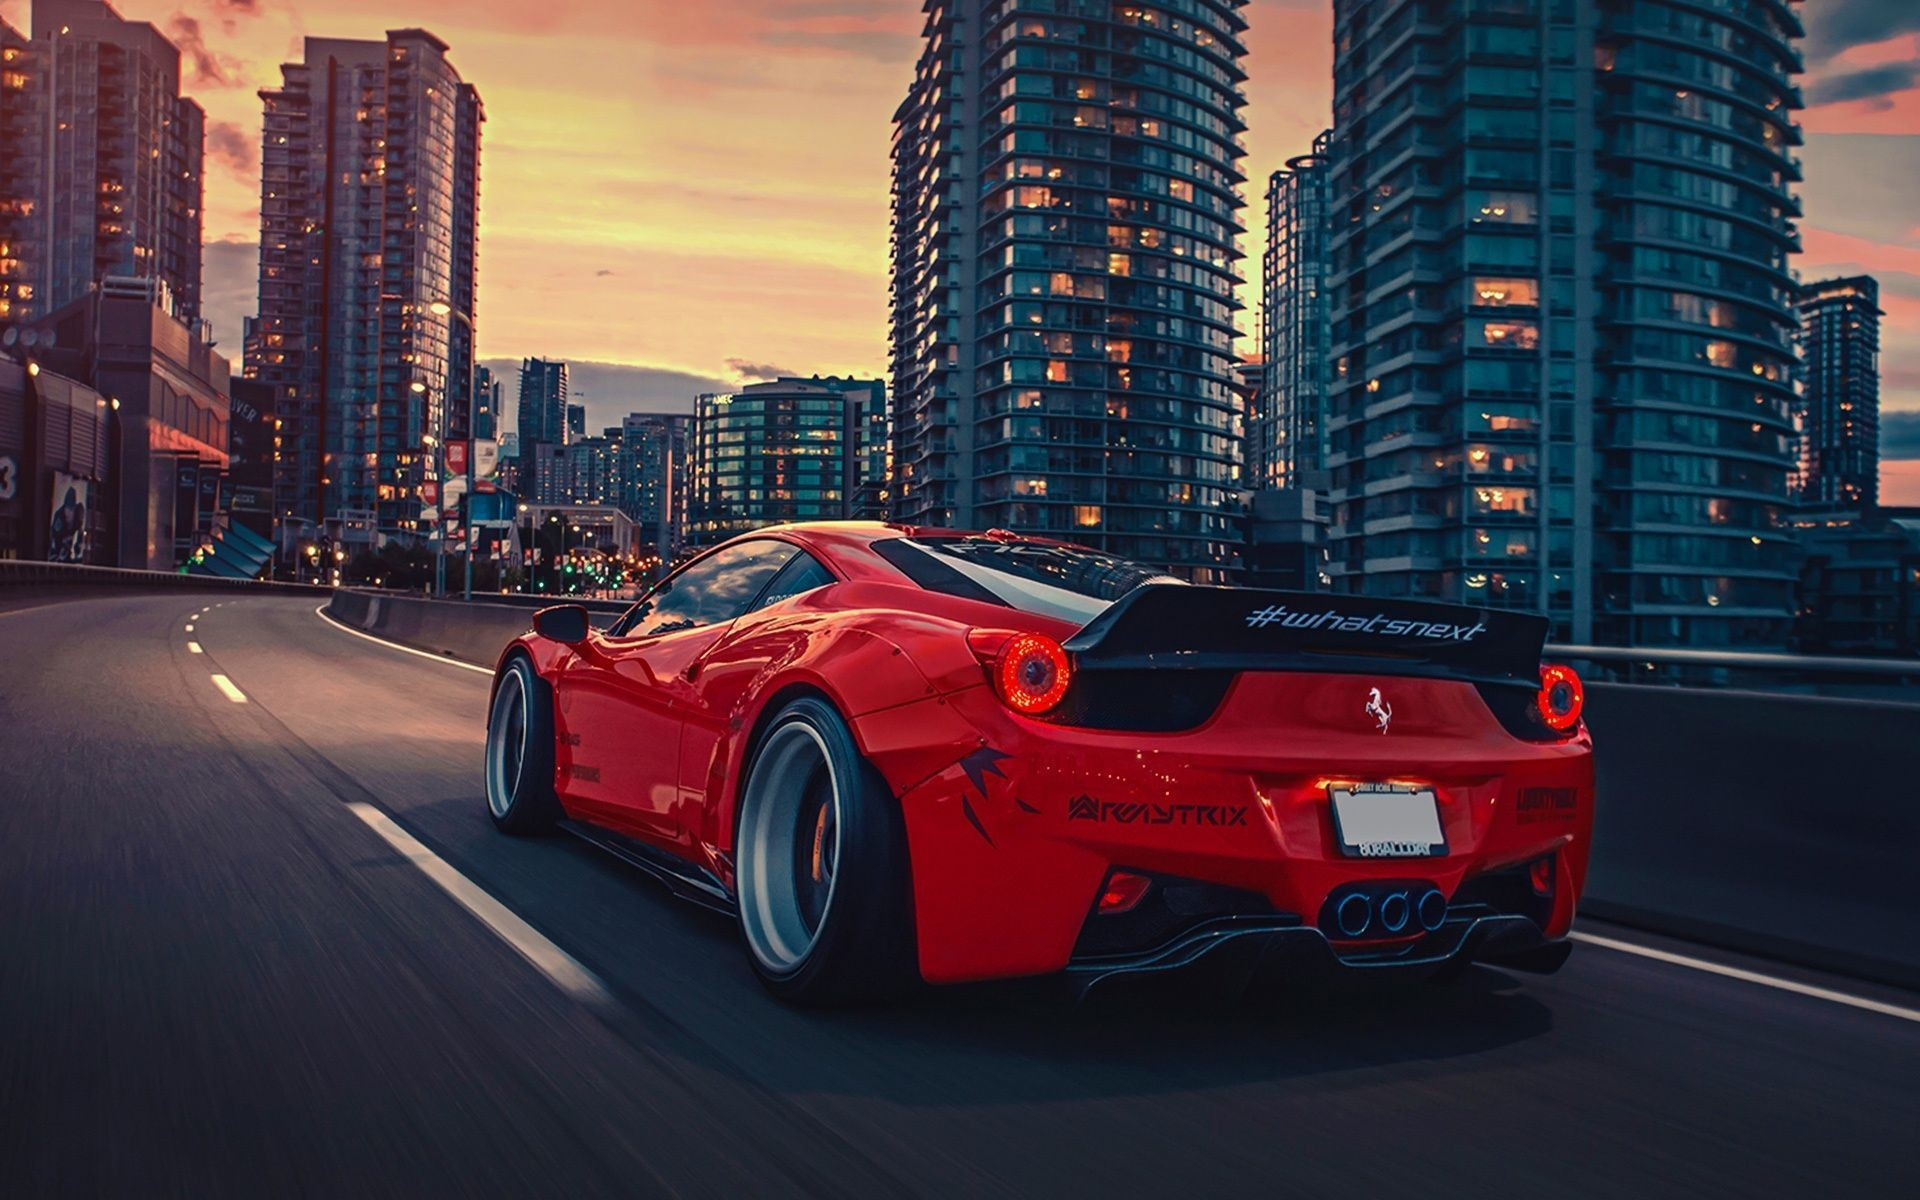 Ferrari 458 Liberty Walk Wallpaper